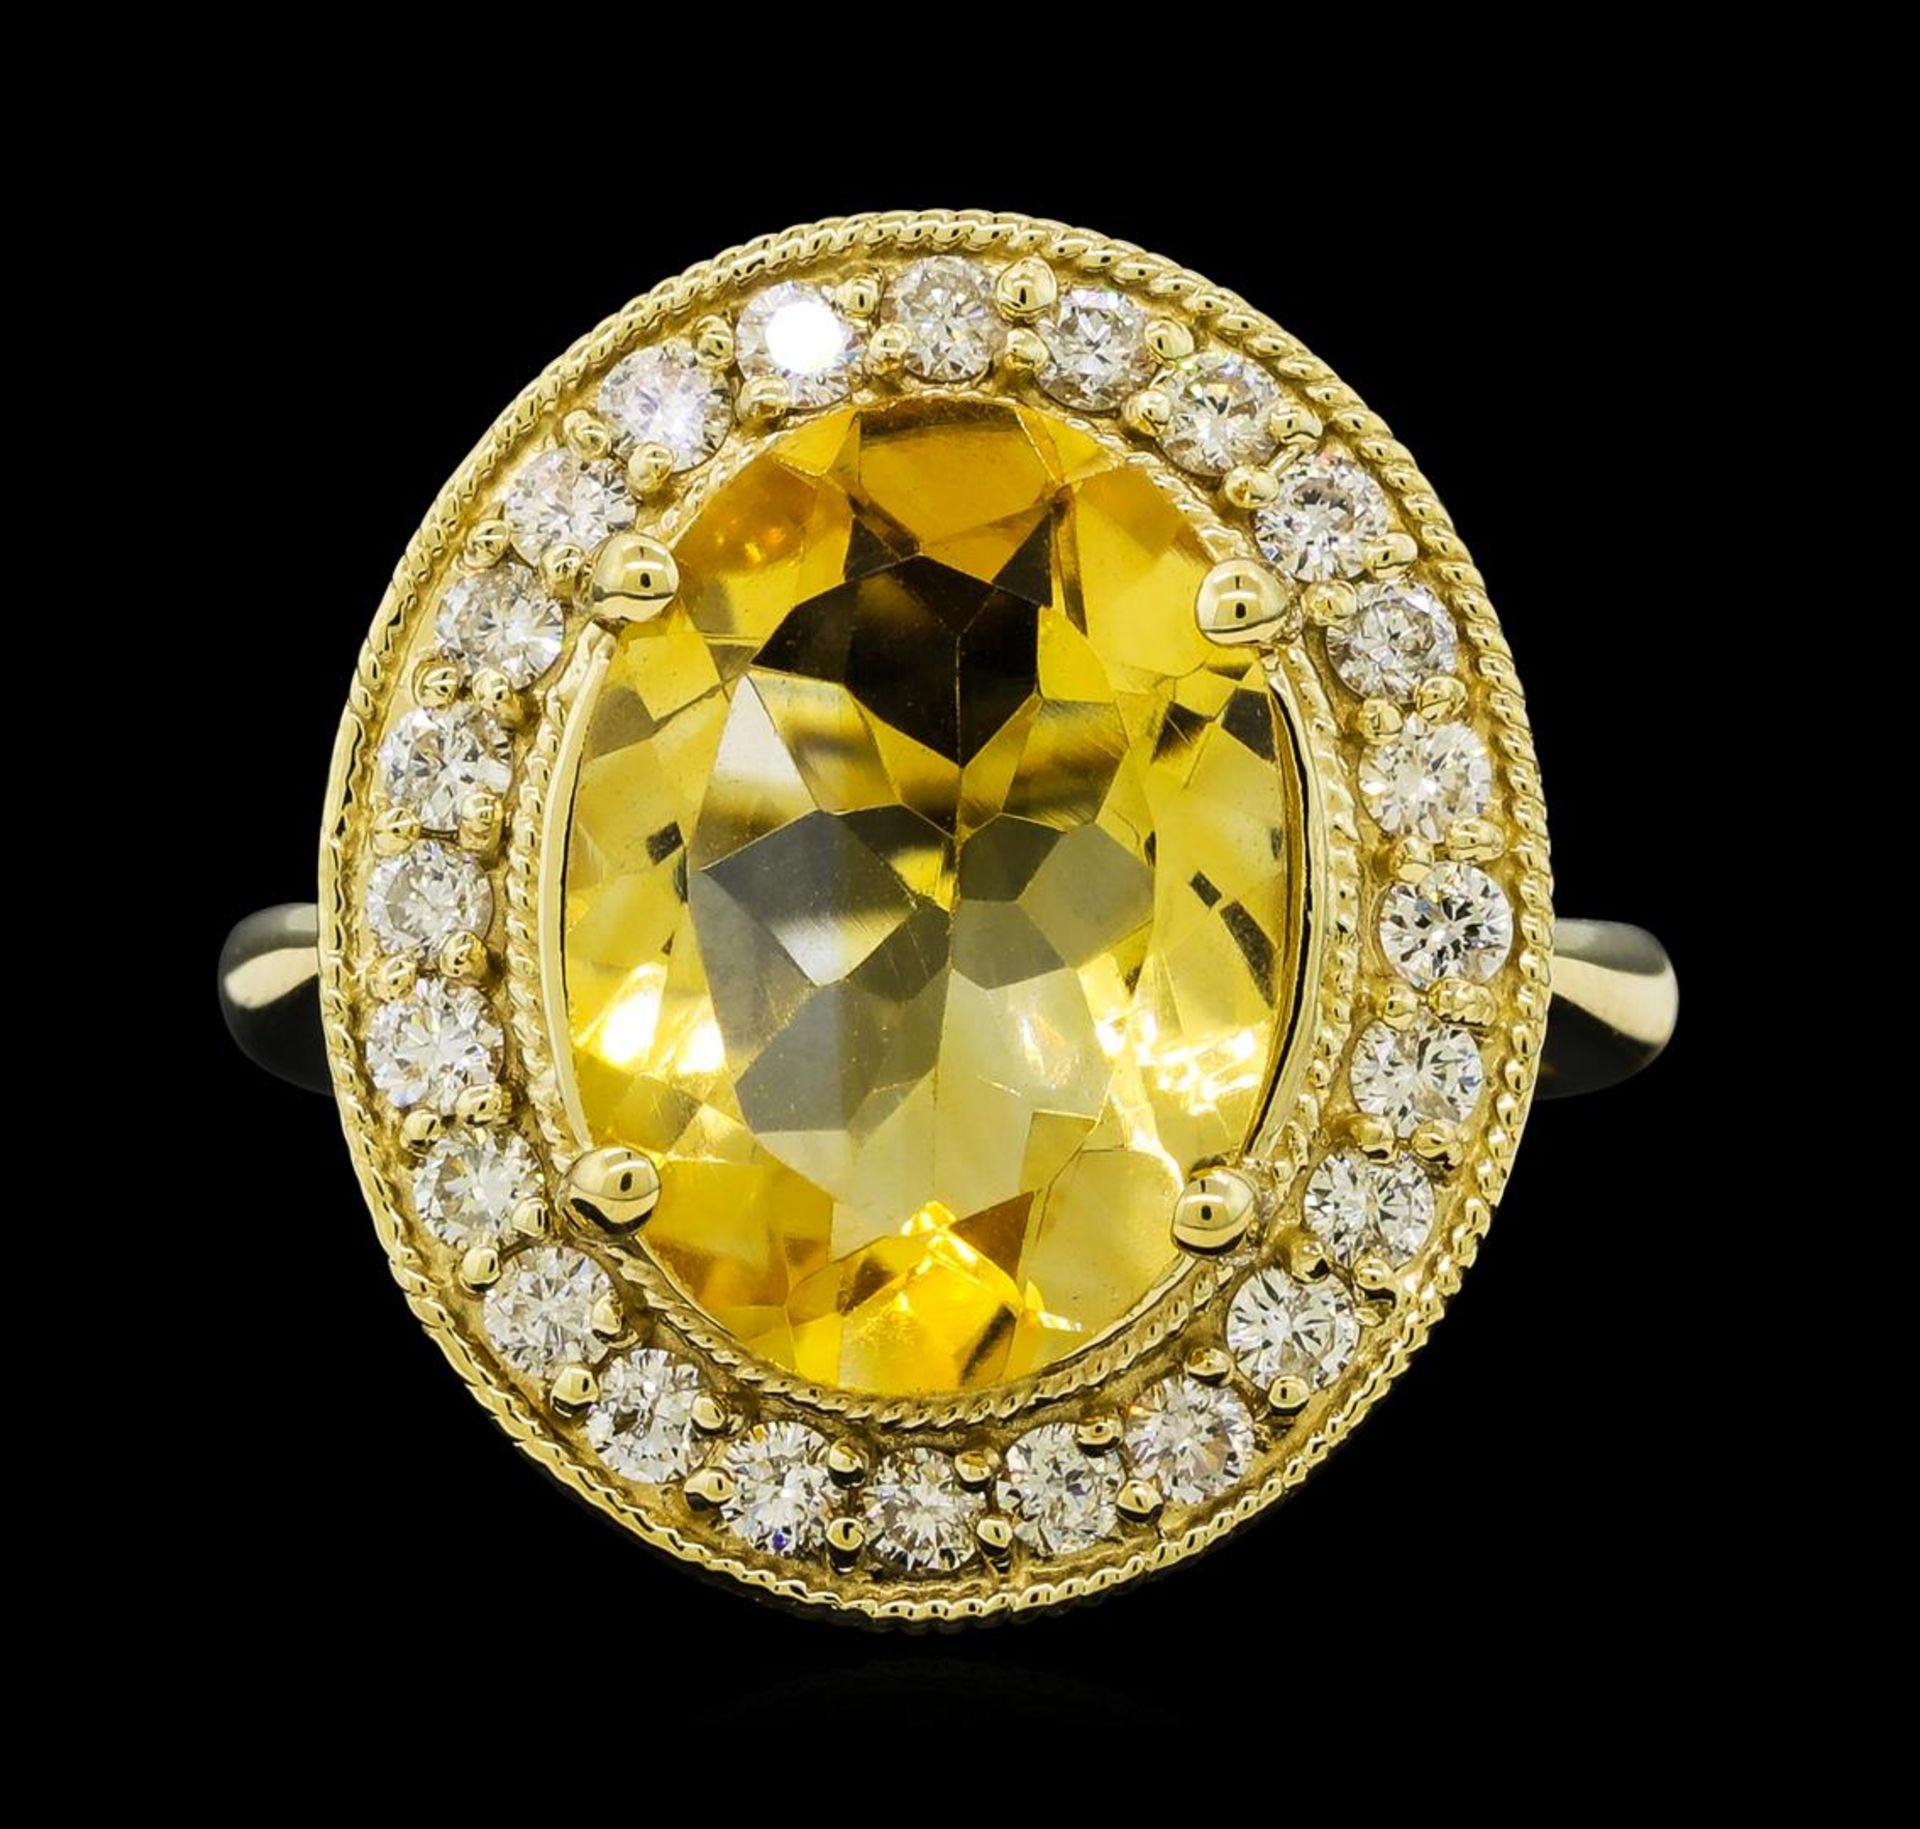 4.22 ctw Citrine Quartz and Diamond Ring - 14KT Yellow Gold - Image 2 of 4